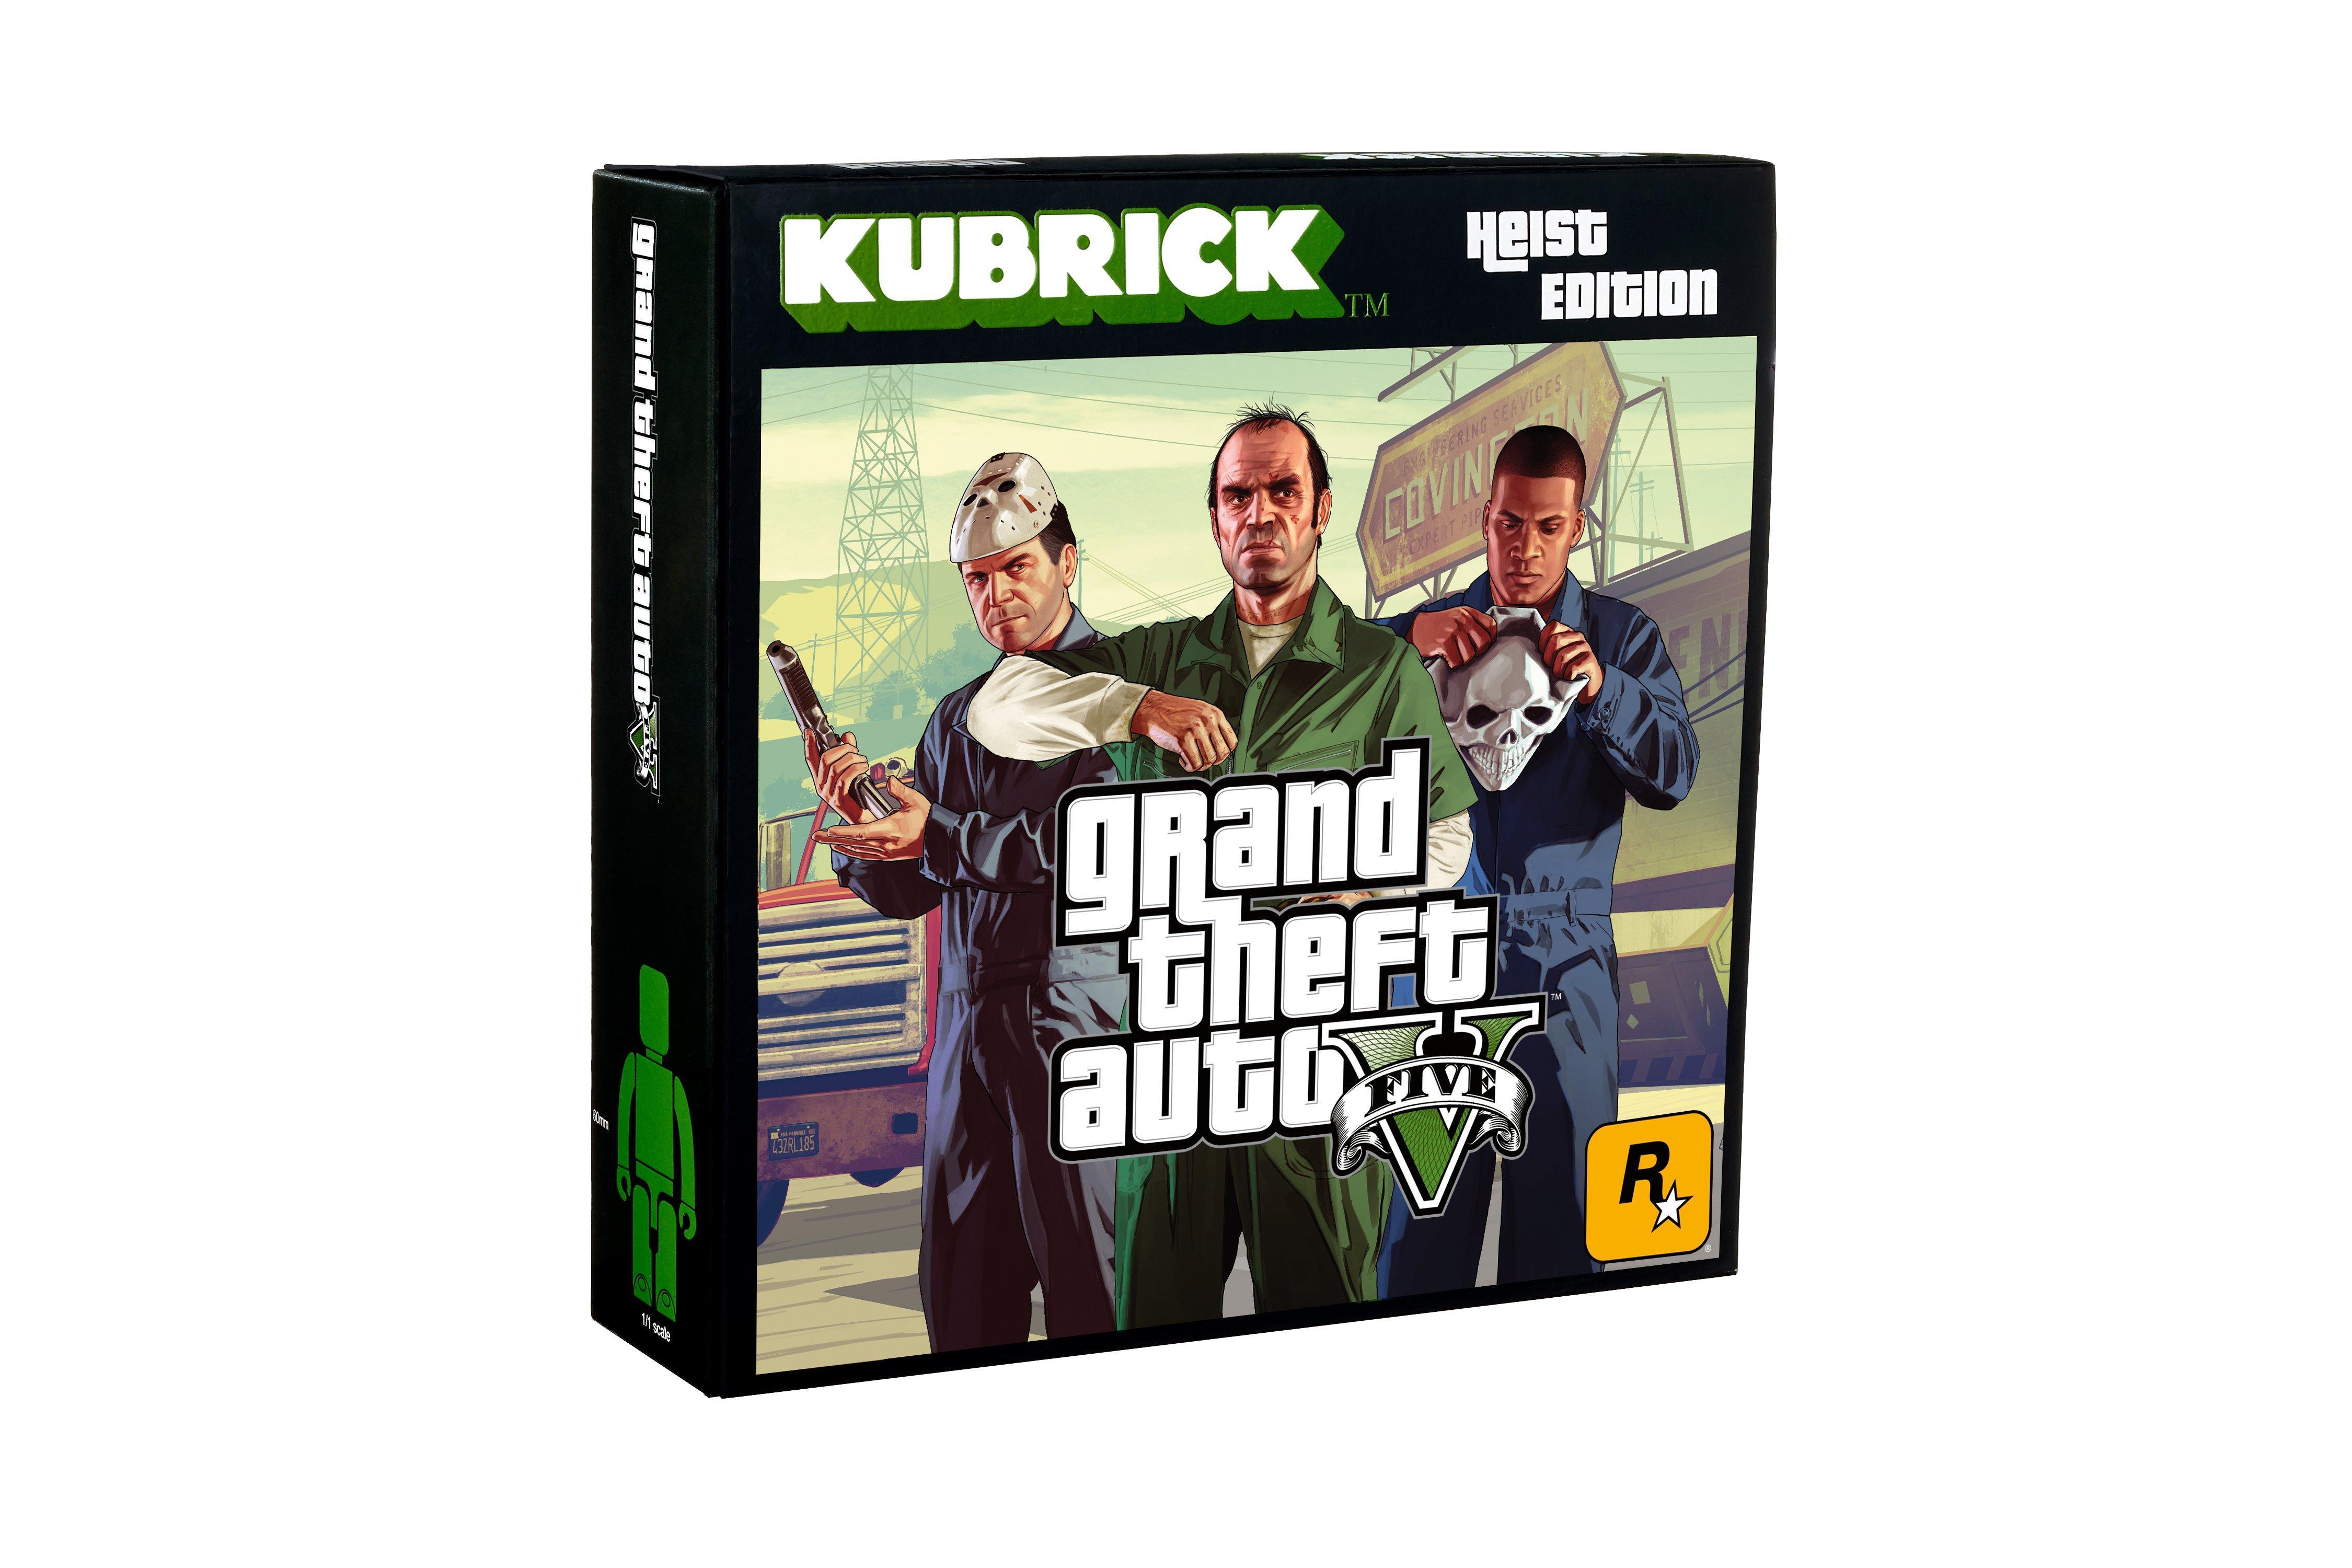 Grand Theft Auto V Heist Kubrick Action Figure Set Gamestop